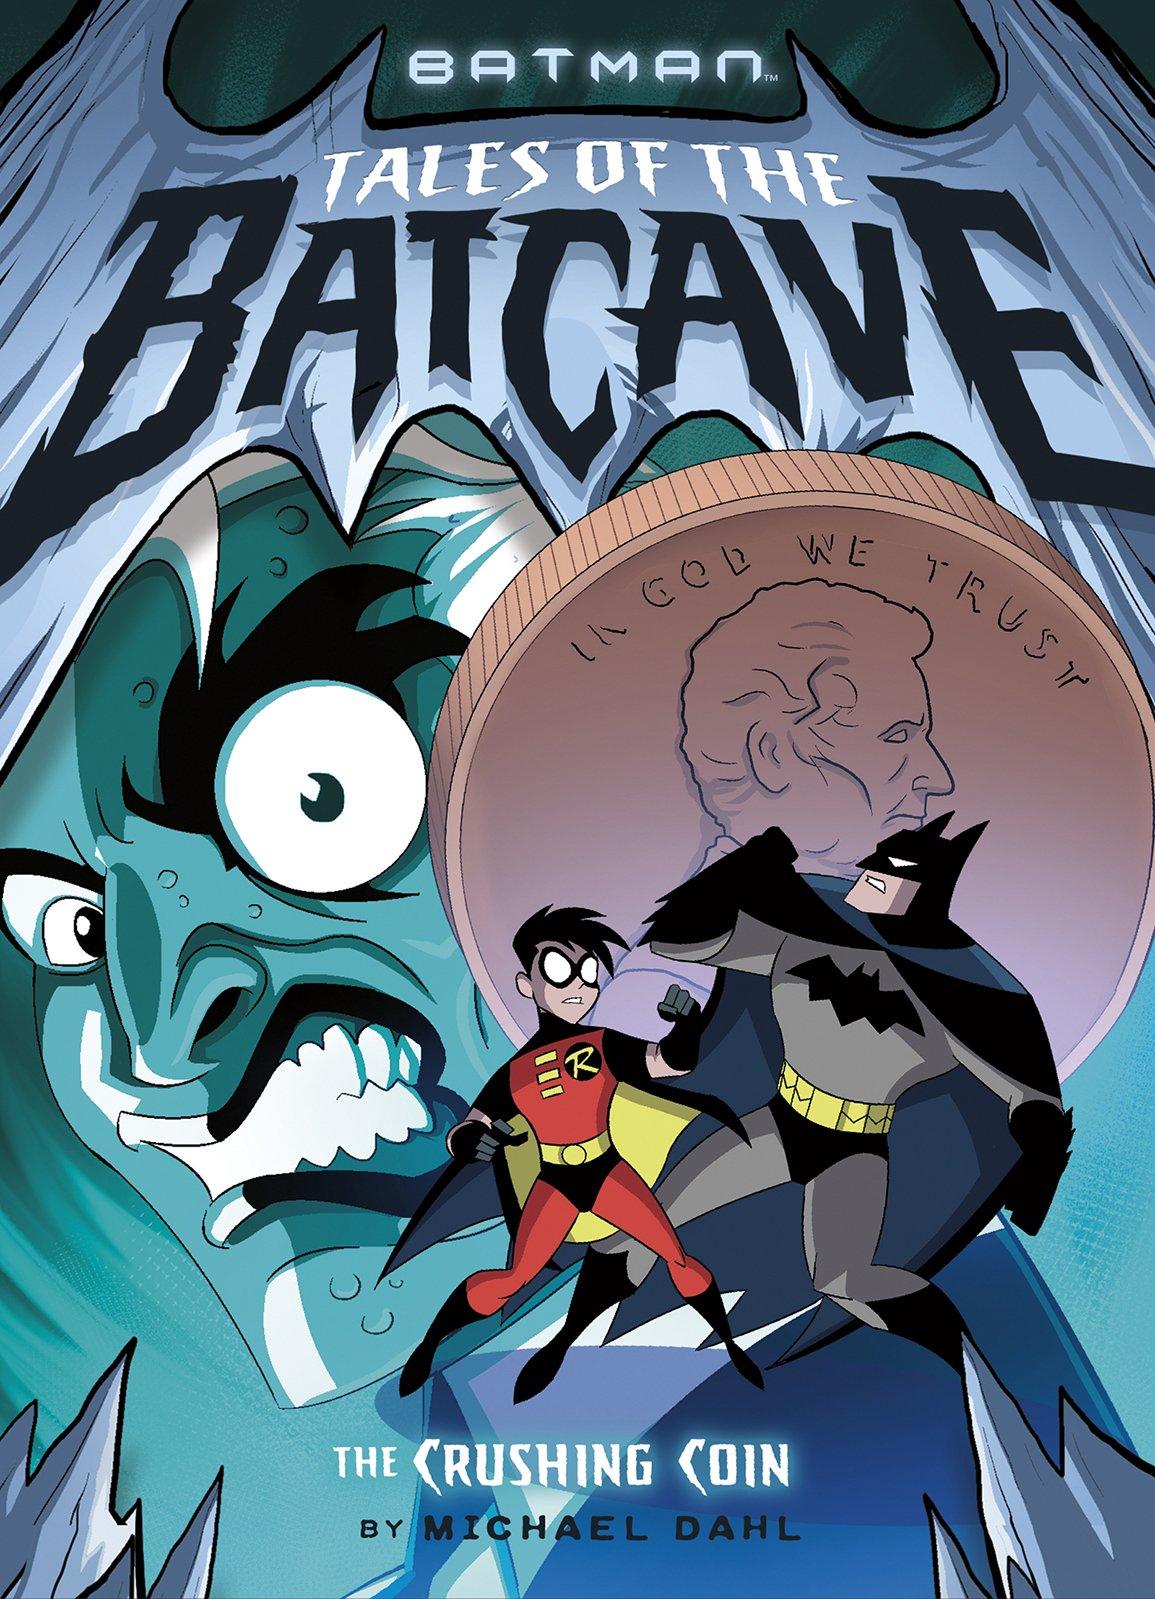 The Crushing Coin (Batman Tales of the Batcave) pdf epub